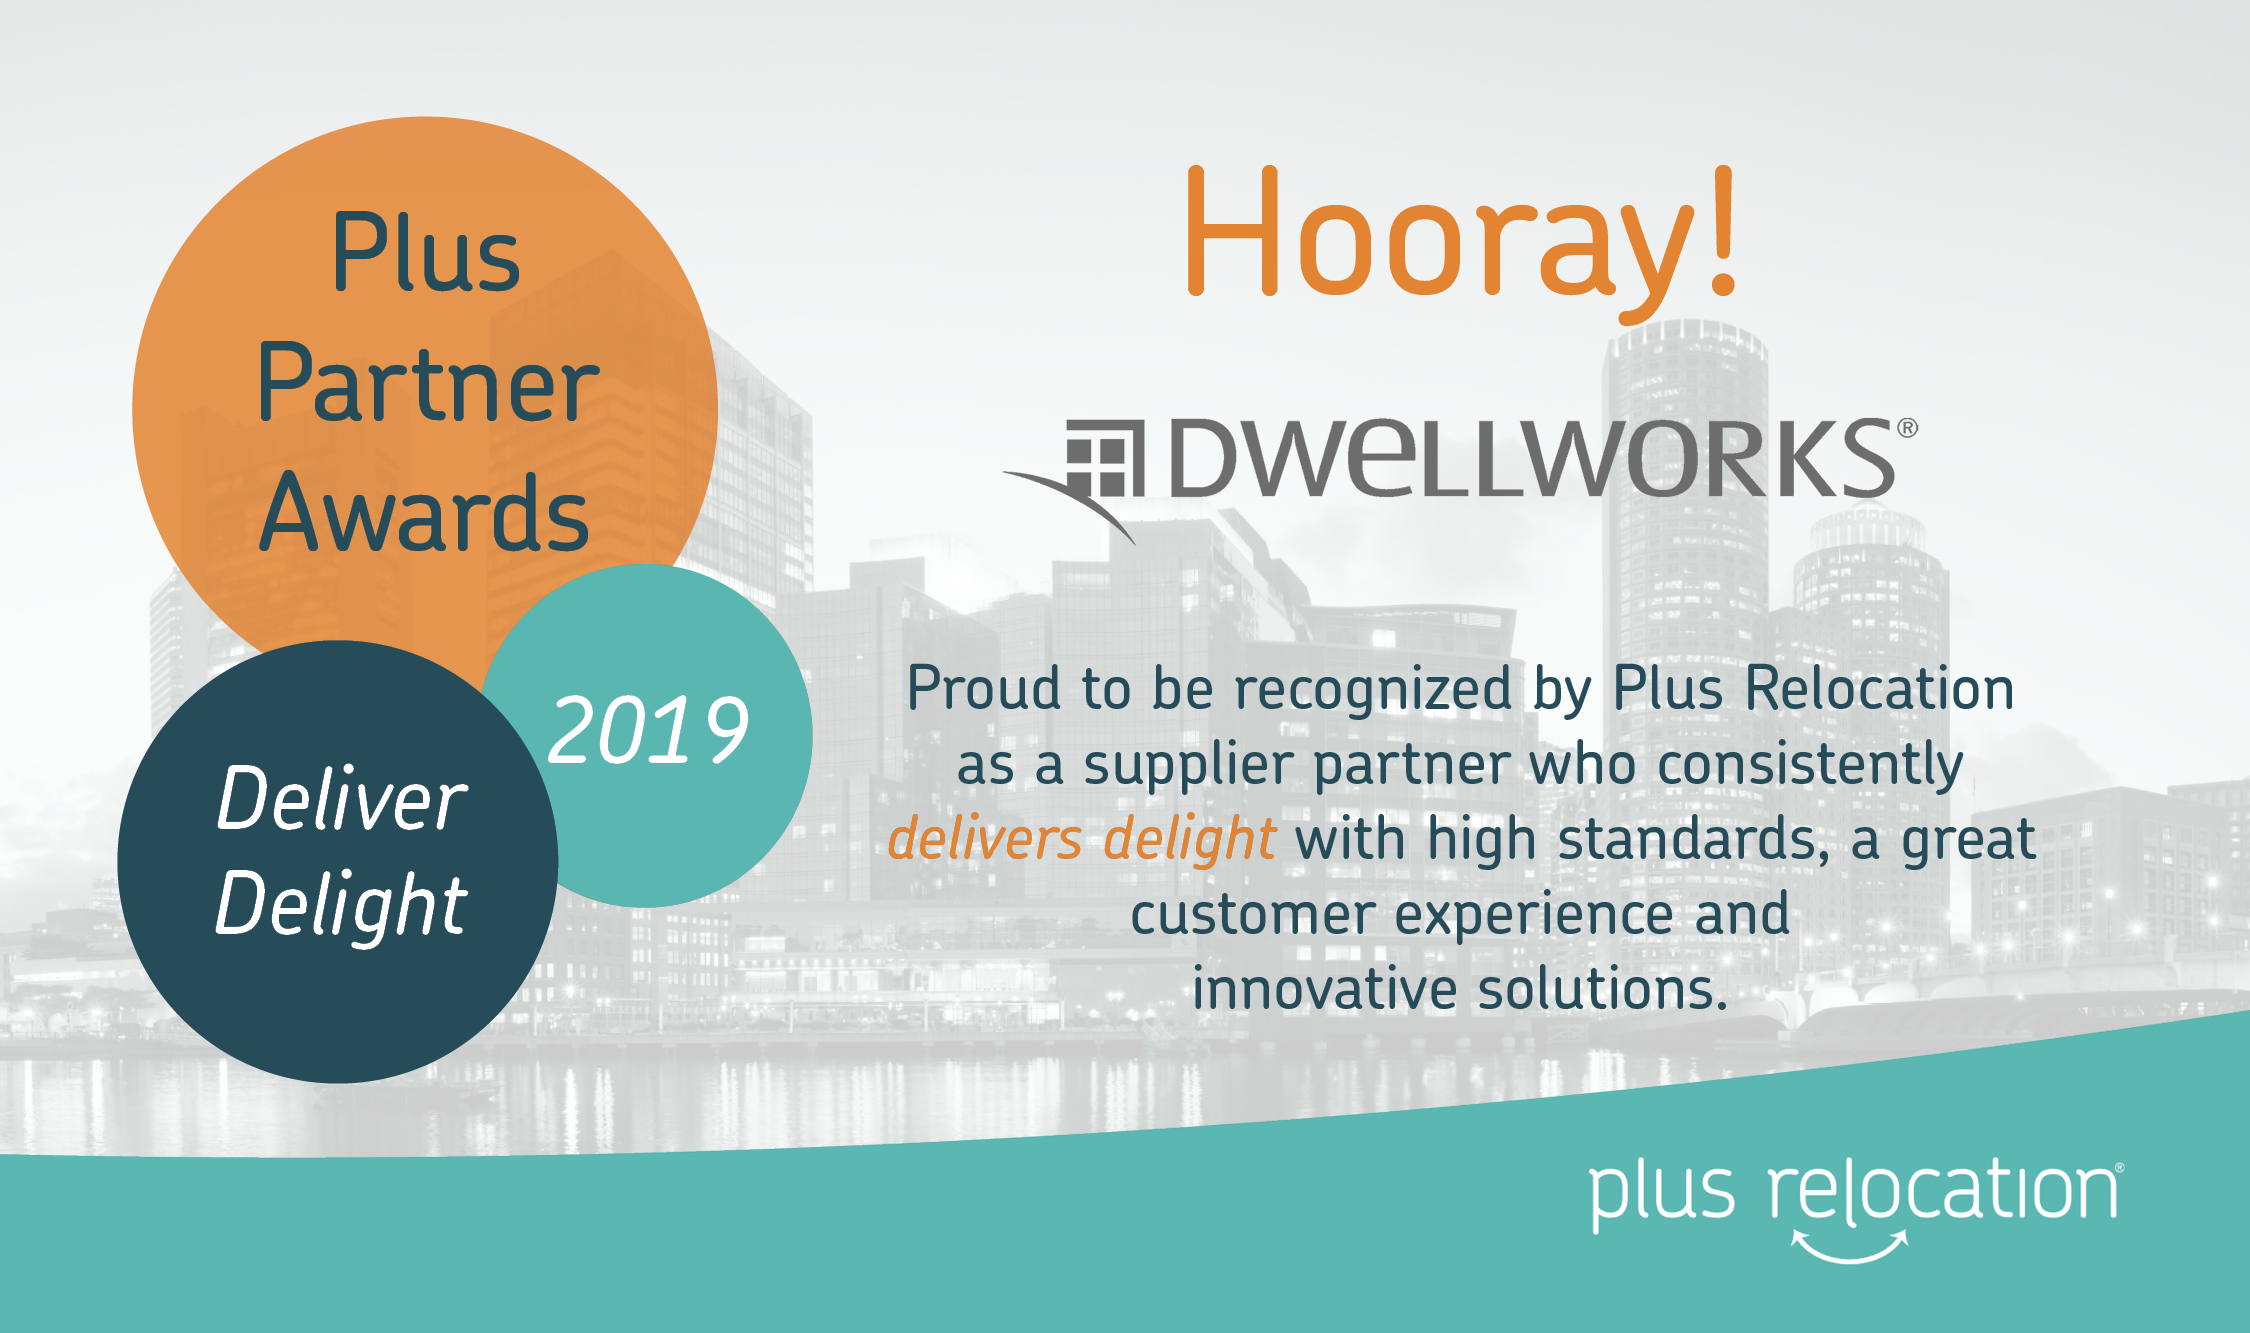 Deliver Delight - Dwellworks